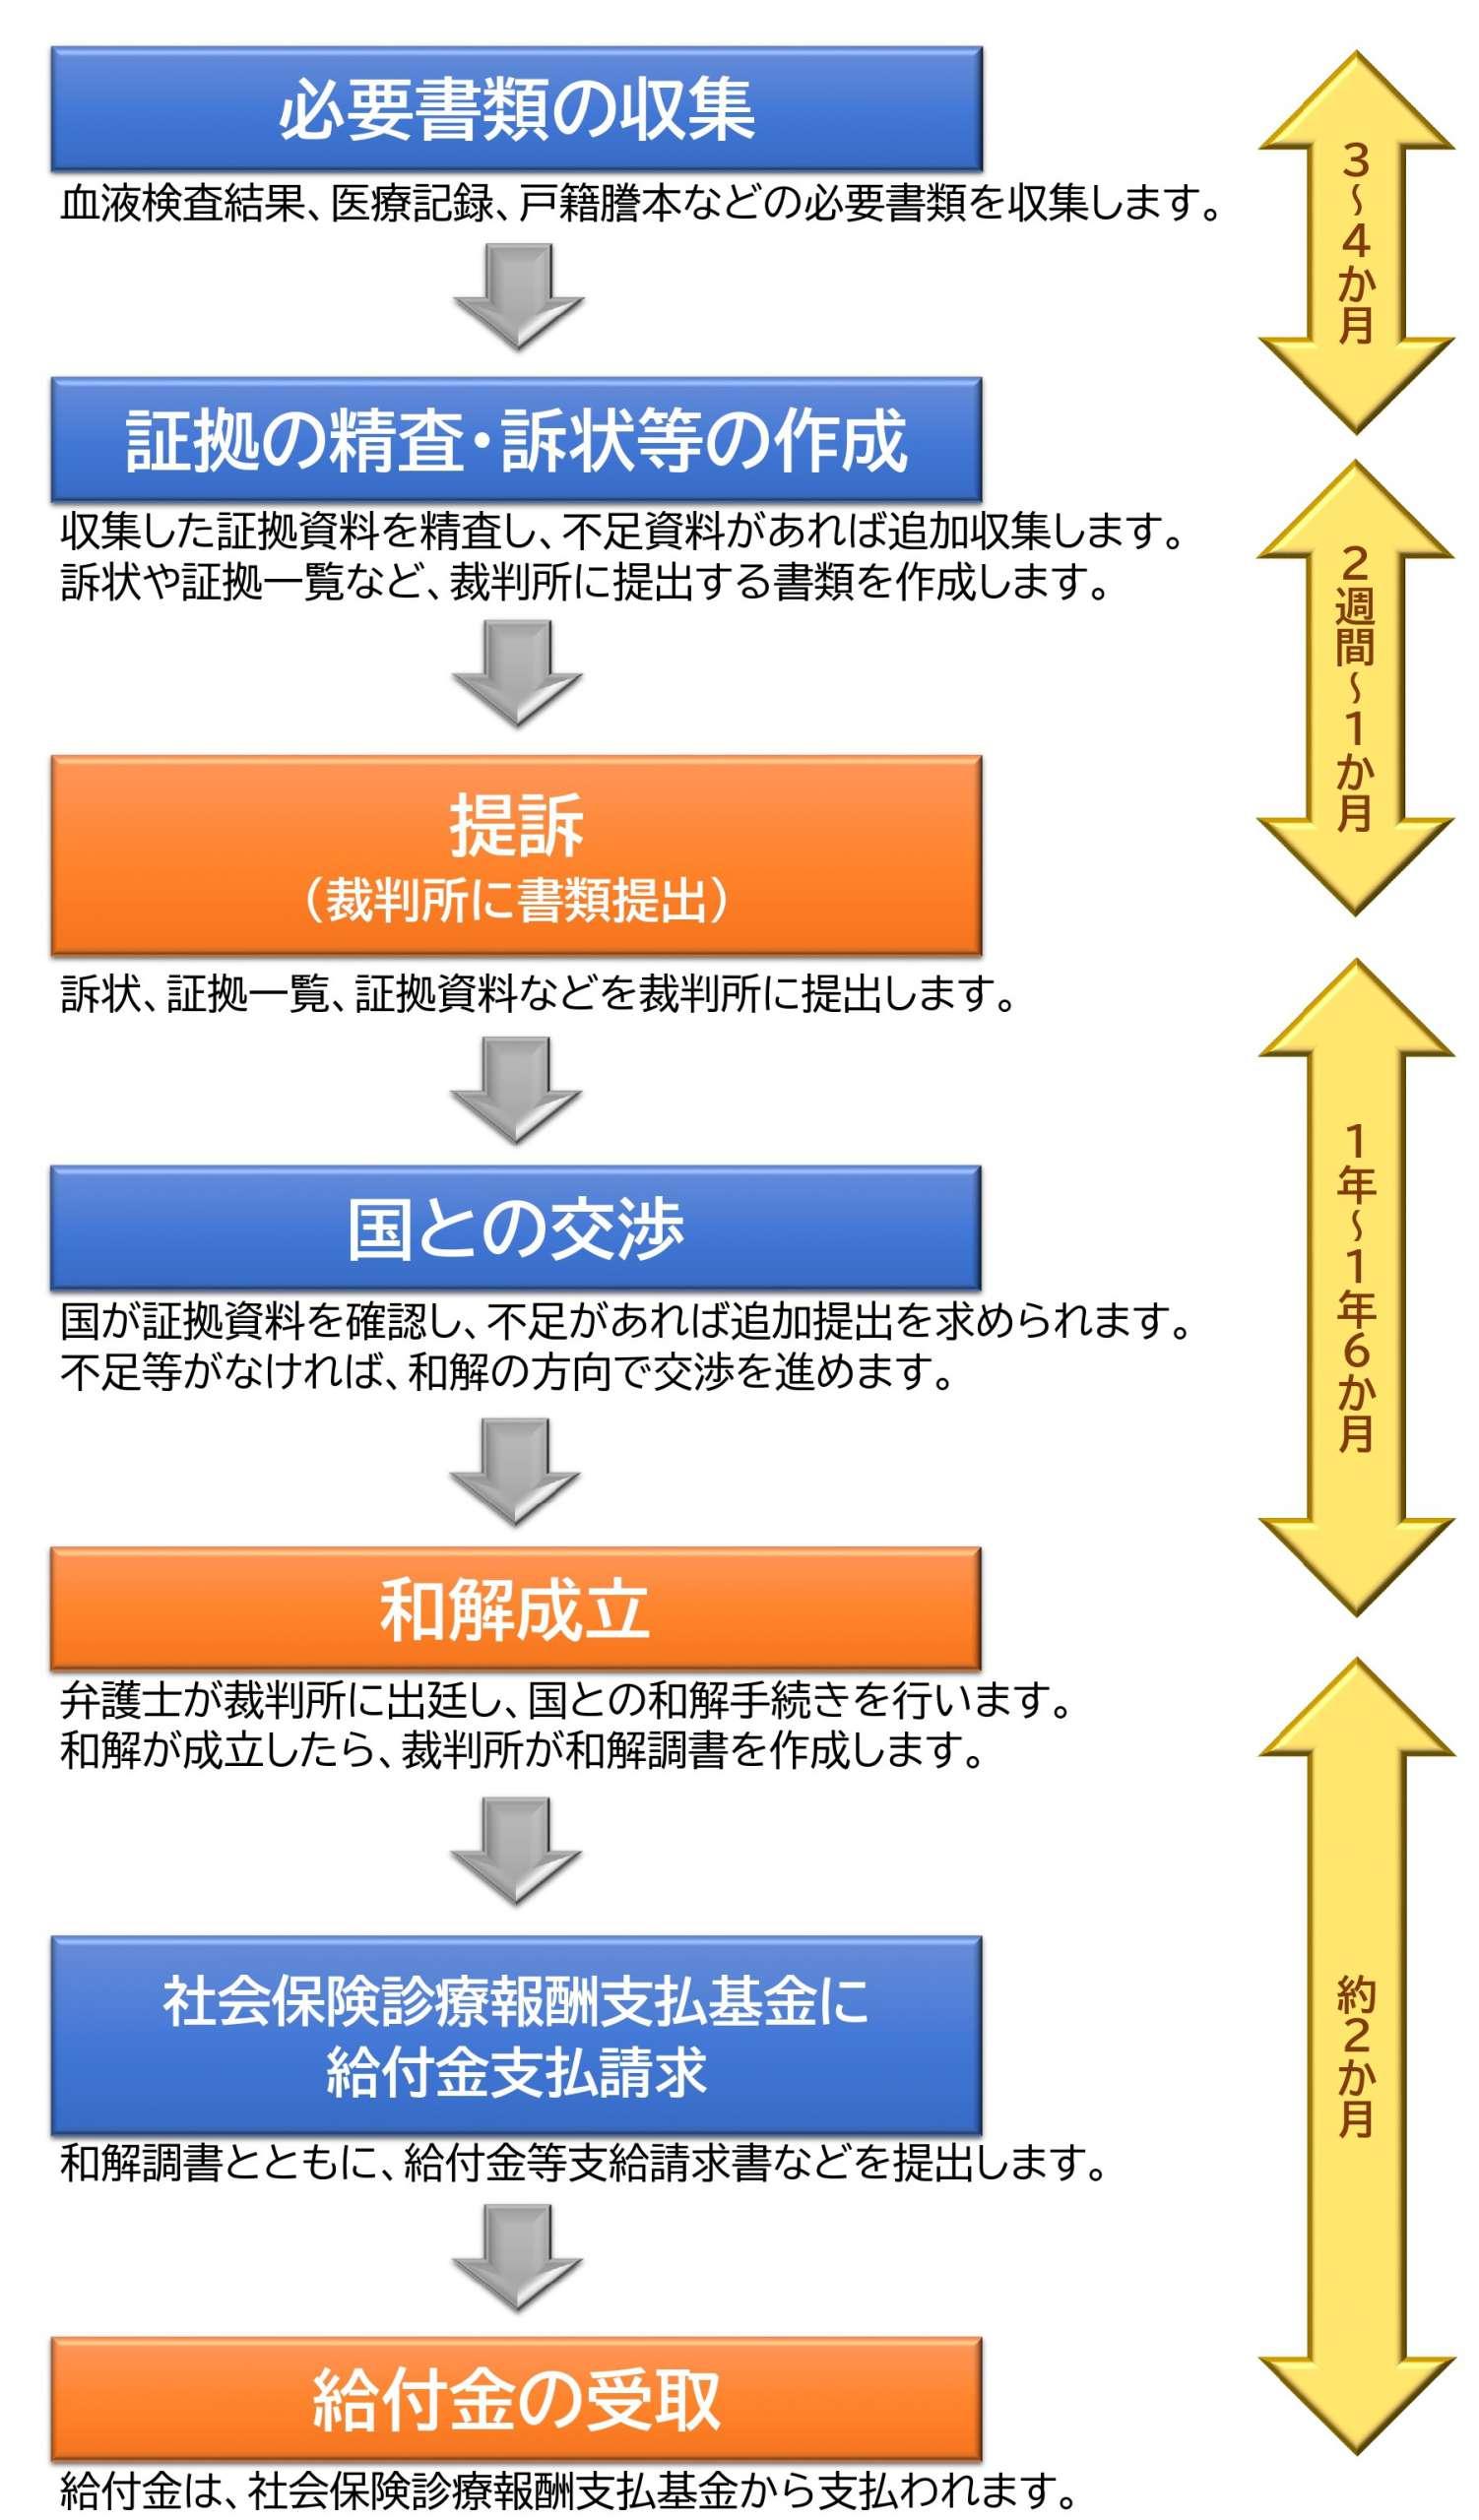 Procedure flow and required period for hepatitis B proceedings